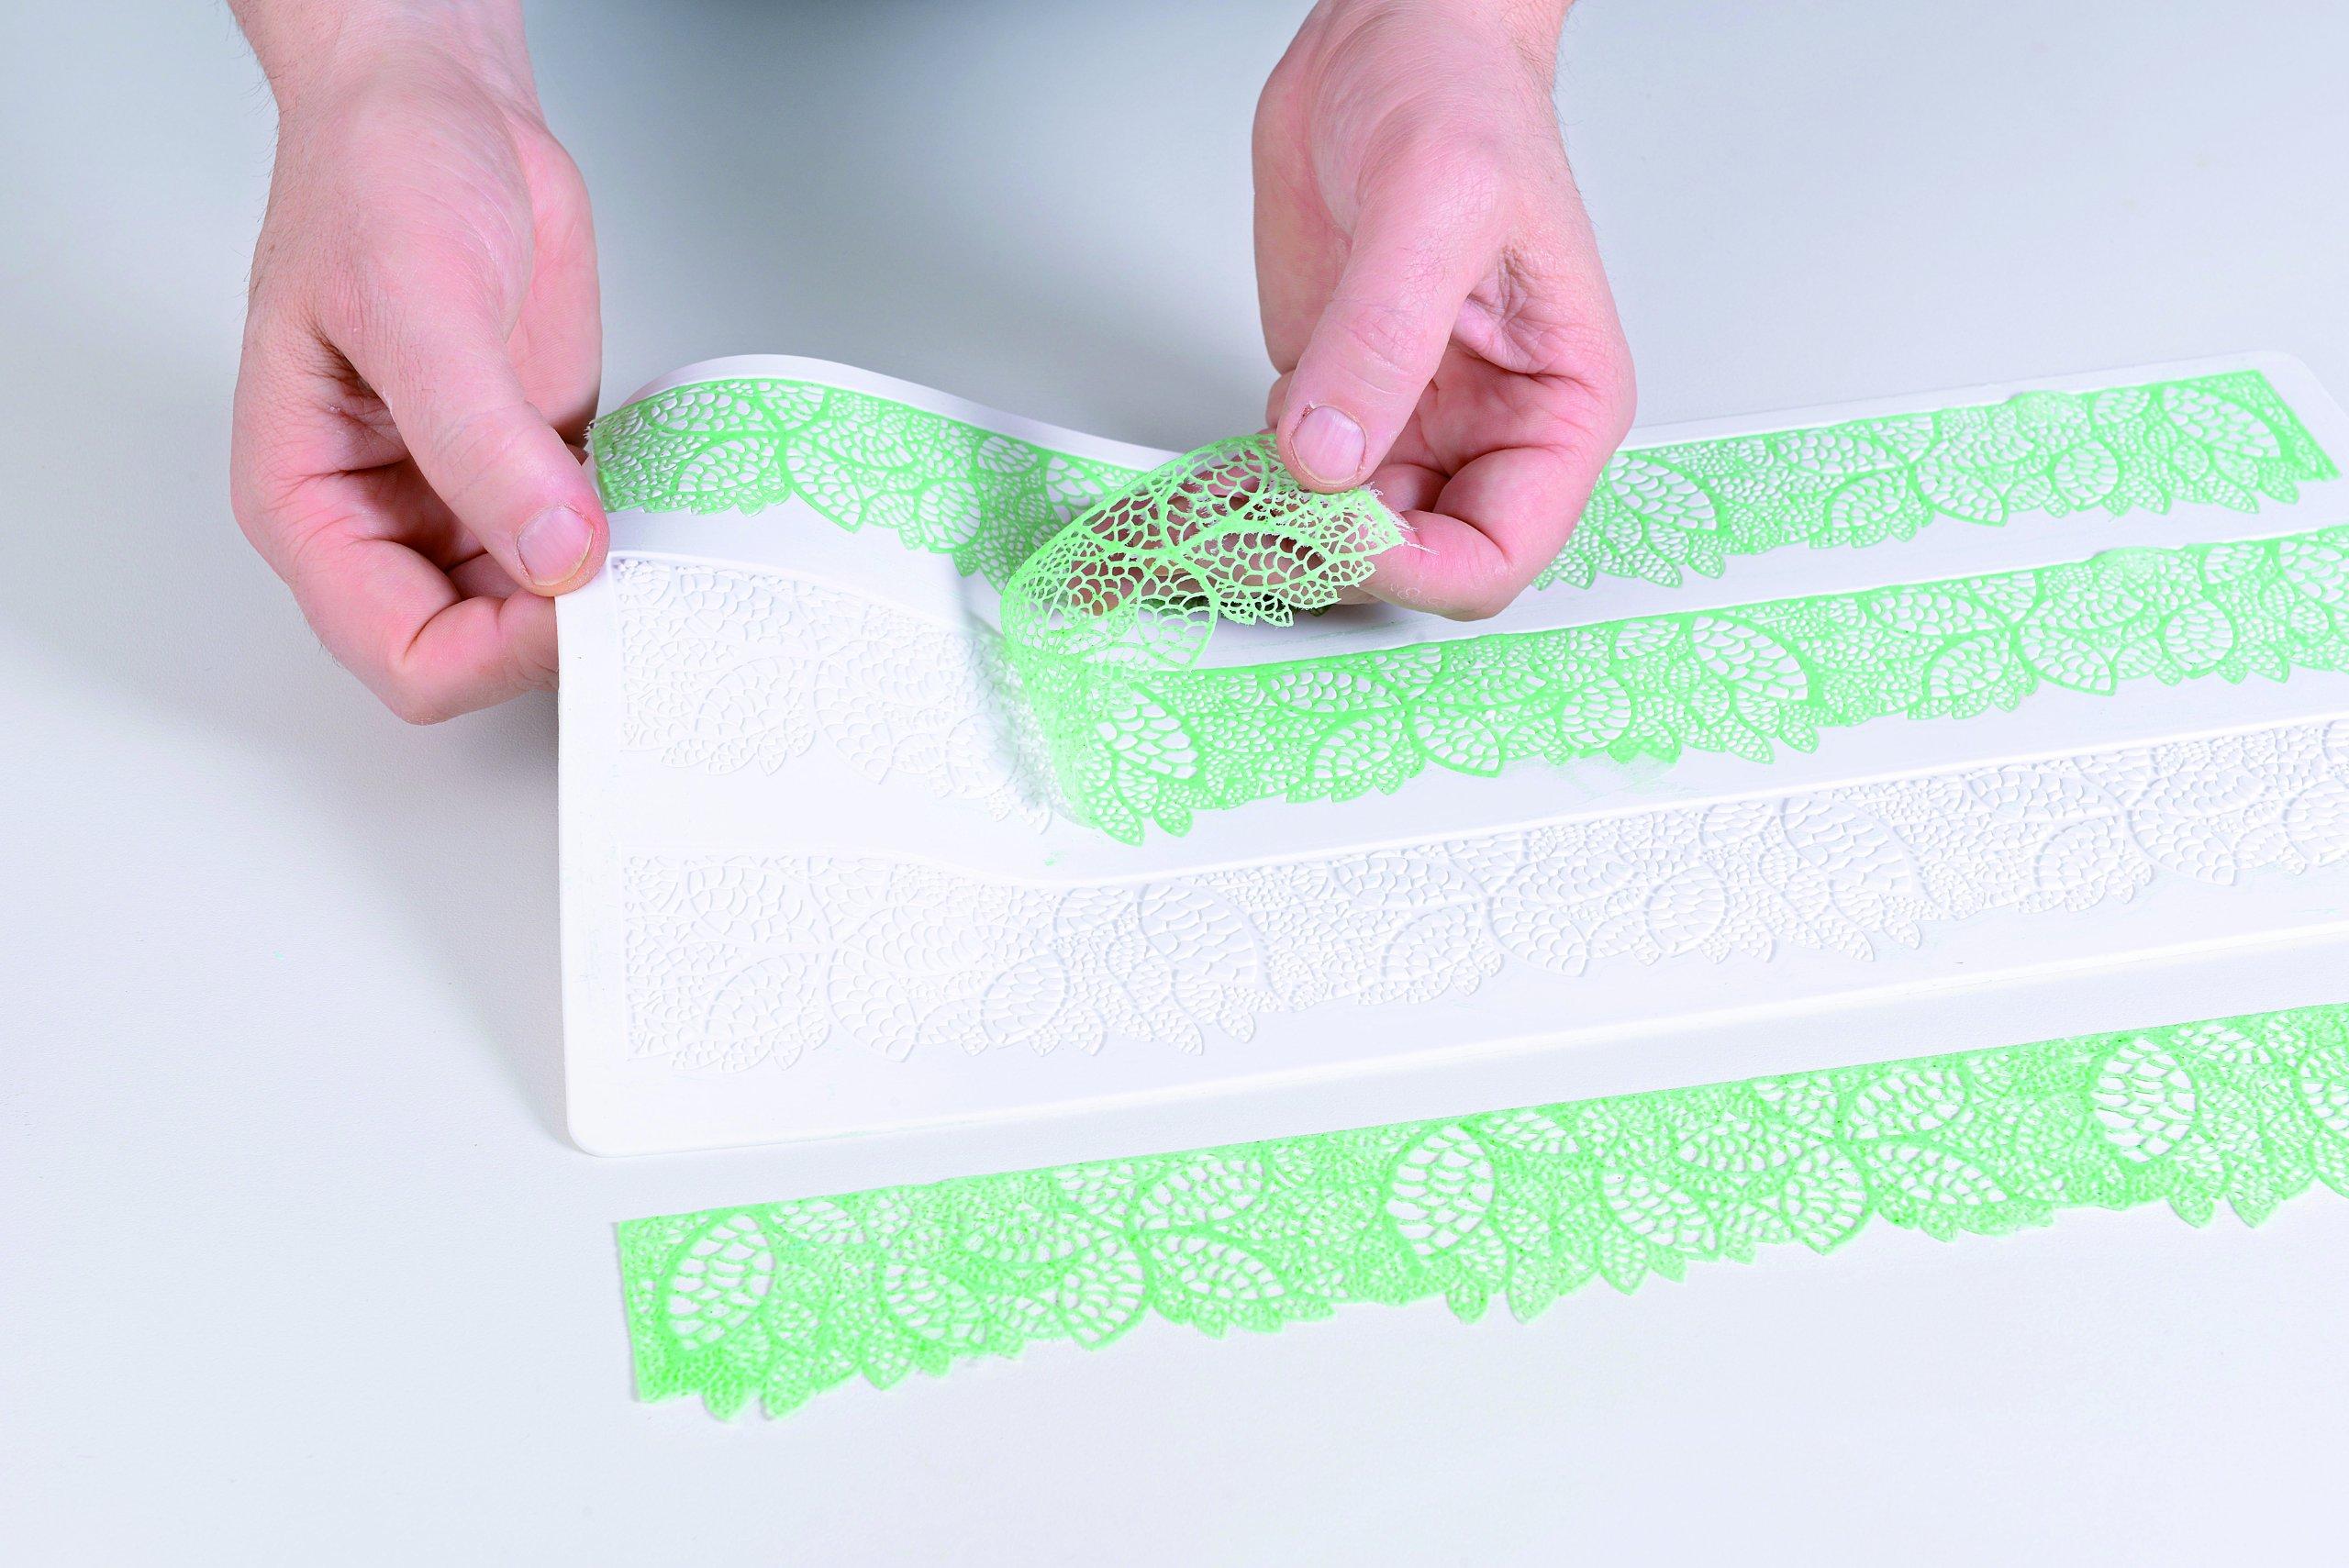 Silikomart Silicone Wonder Cakes Collection Sugar Lace Mats for Cake Decoration, Leaves by Silikomart (Image #3)